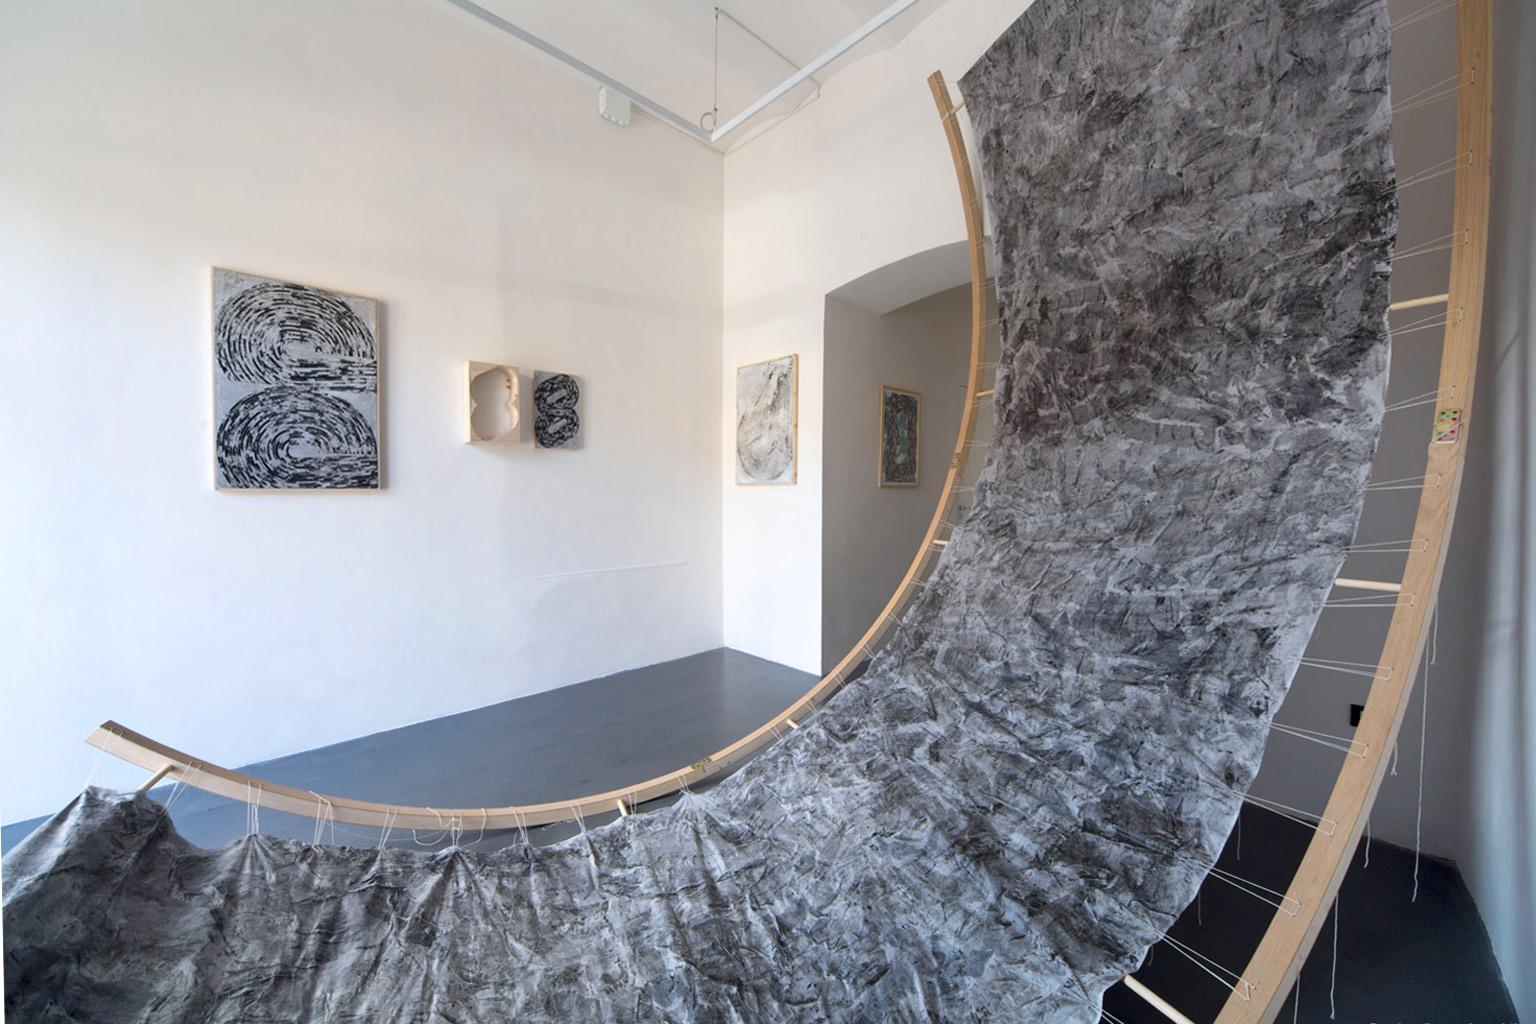 Martina Merlini Enfasi CRAC - Chiara Ronchini Arte Contemporanea